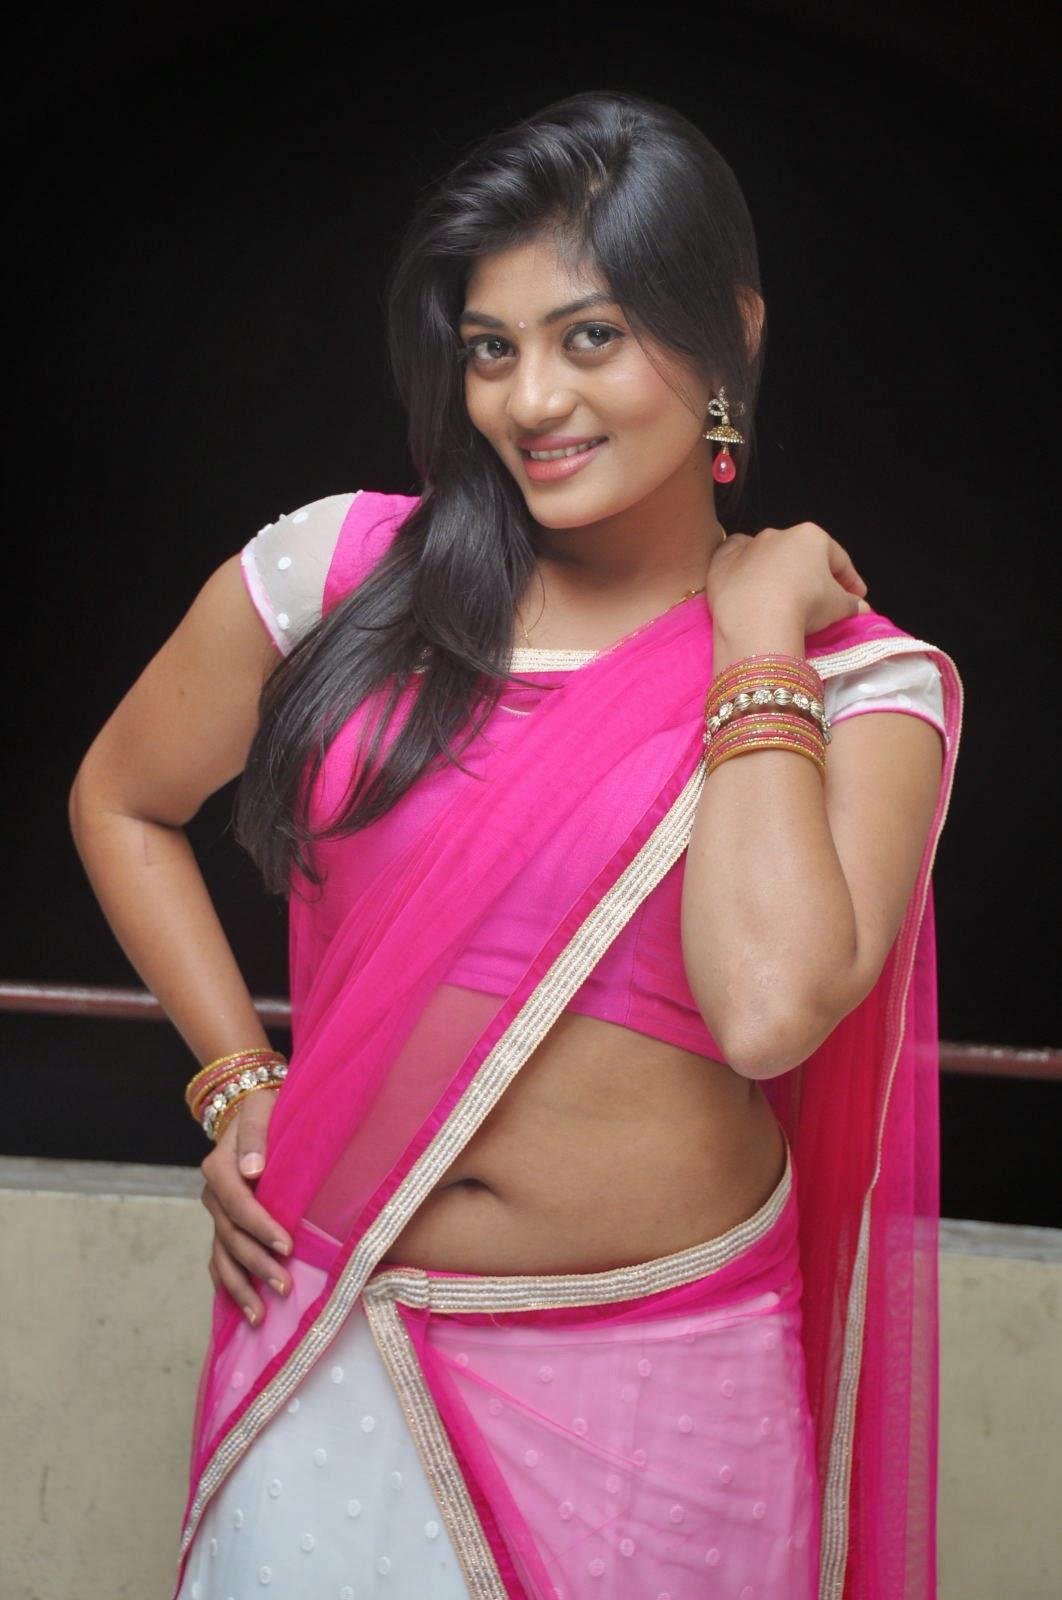 Desi girls telugu Young Girls